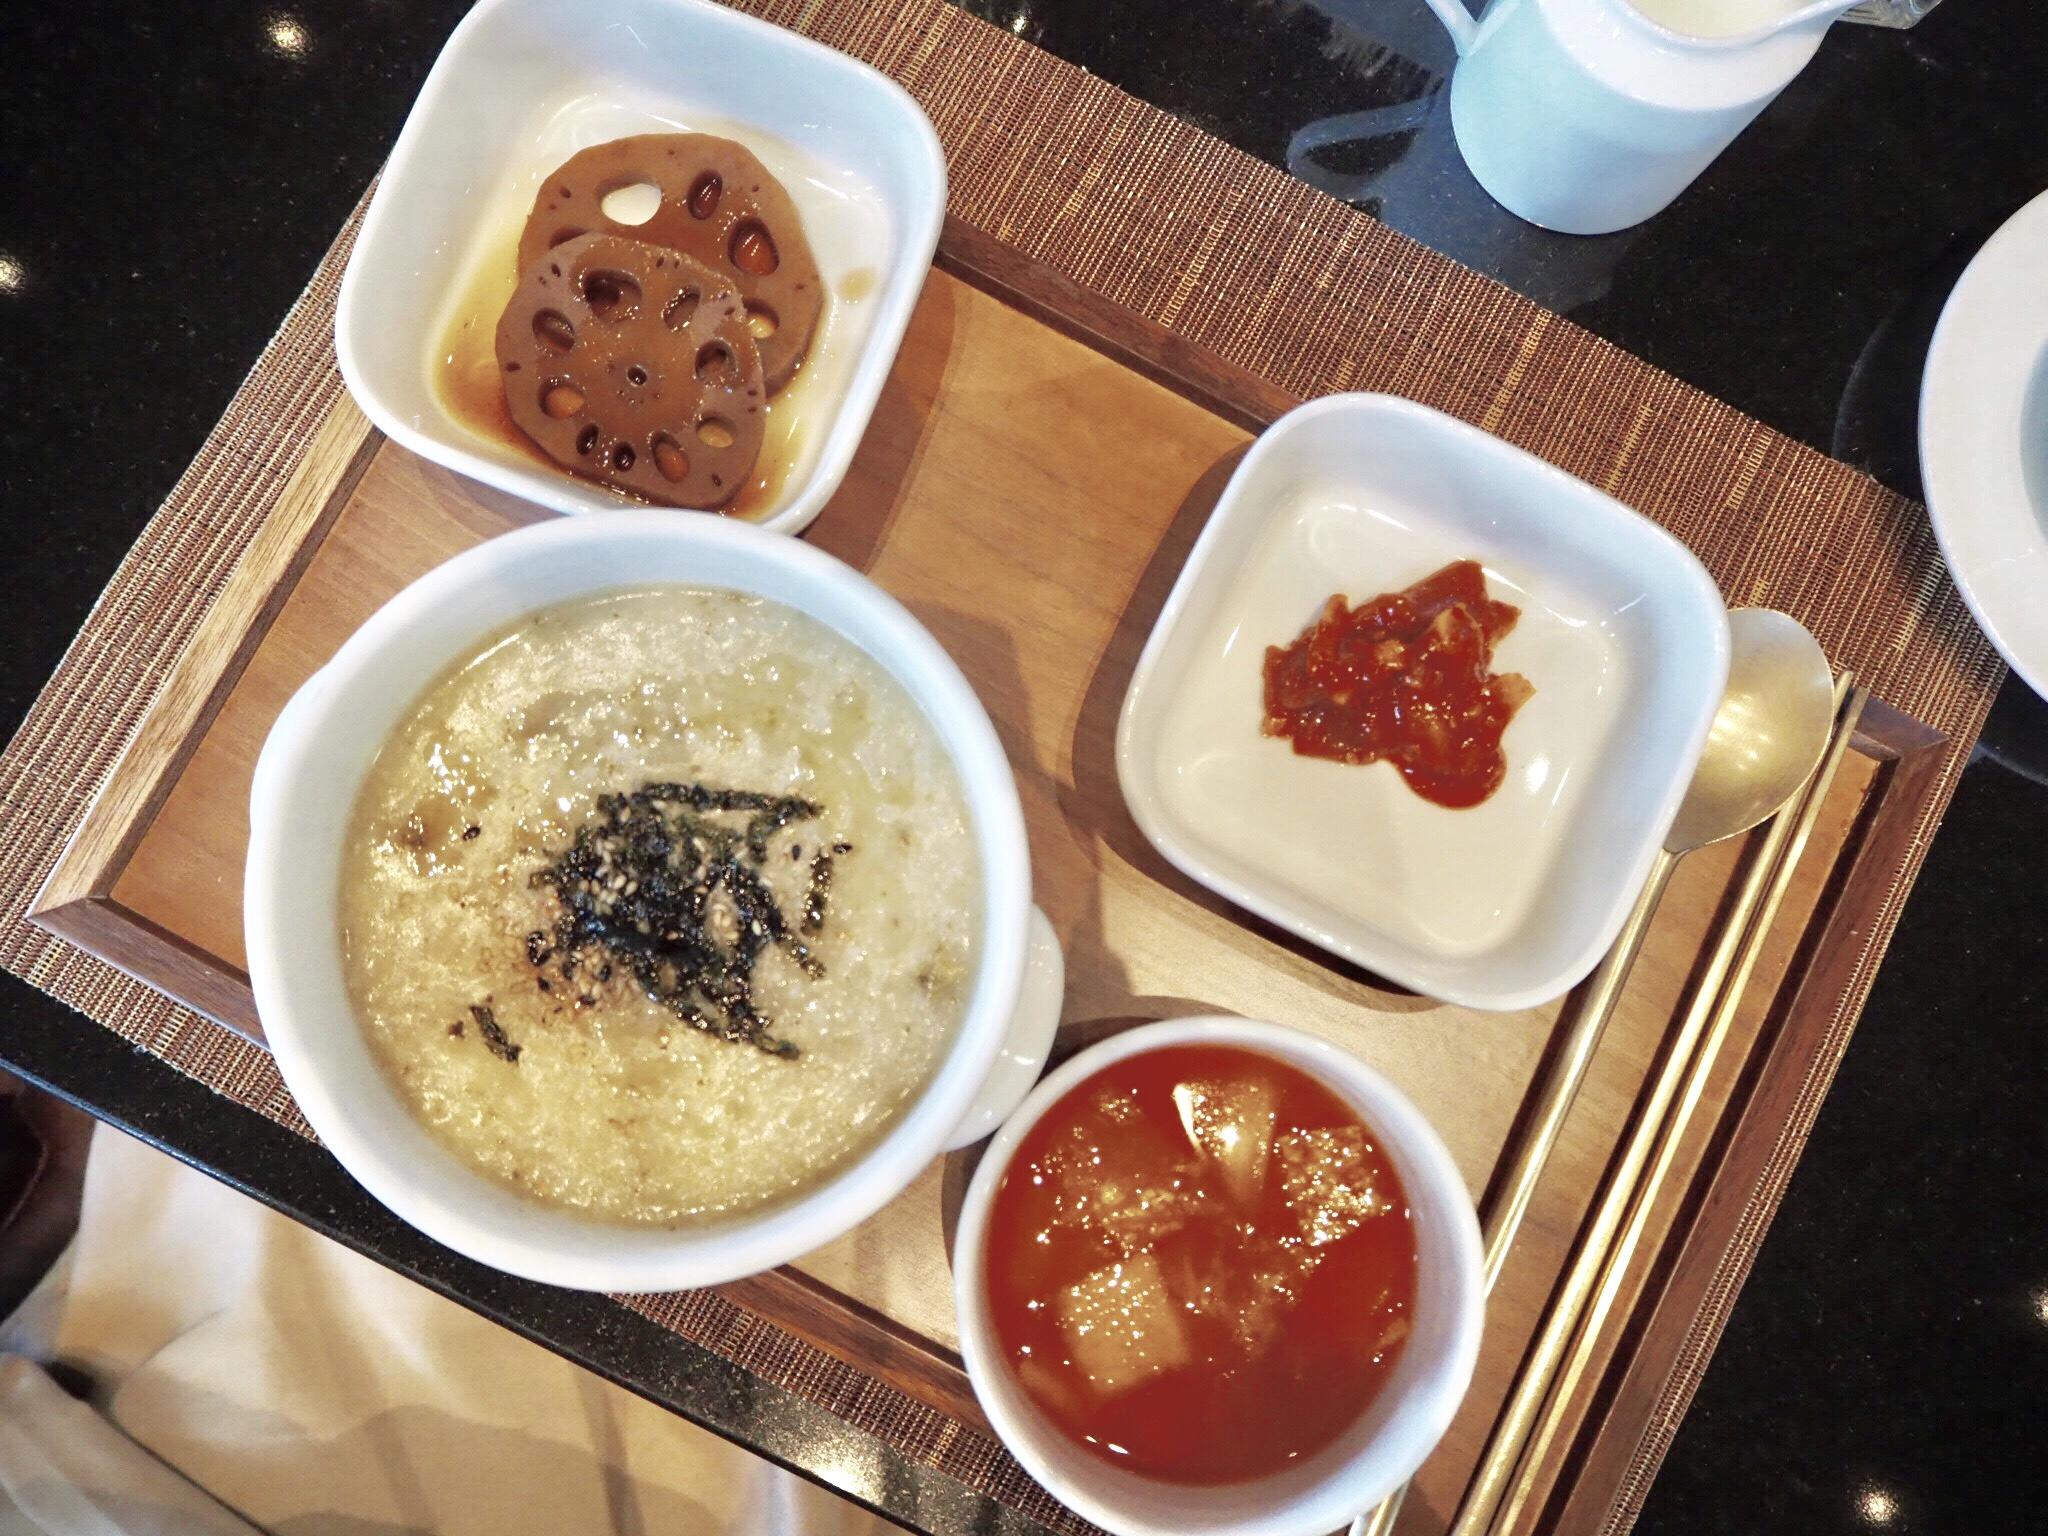 img 8047 - Banyan Tree Club & Spa Seoul - リピーターにお勧めしたい韓国ソウルのちょっと贅沢なステイ先